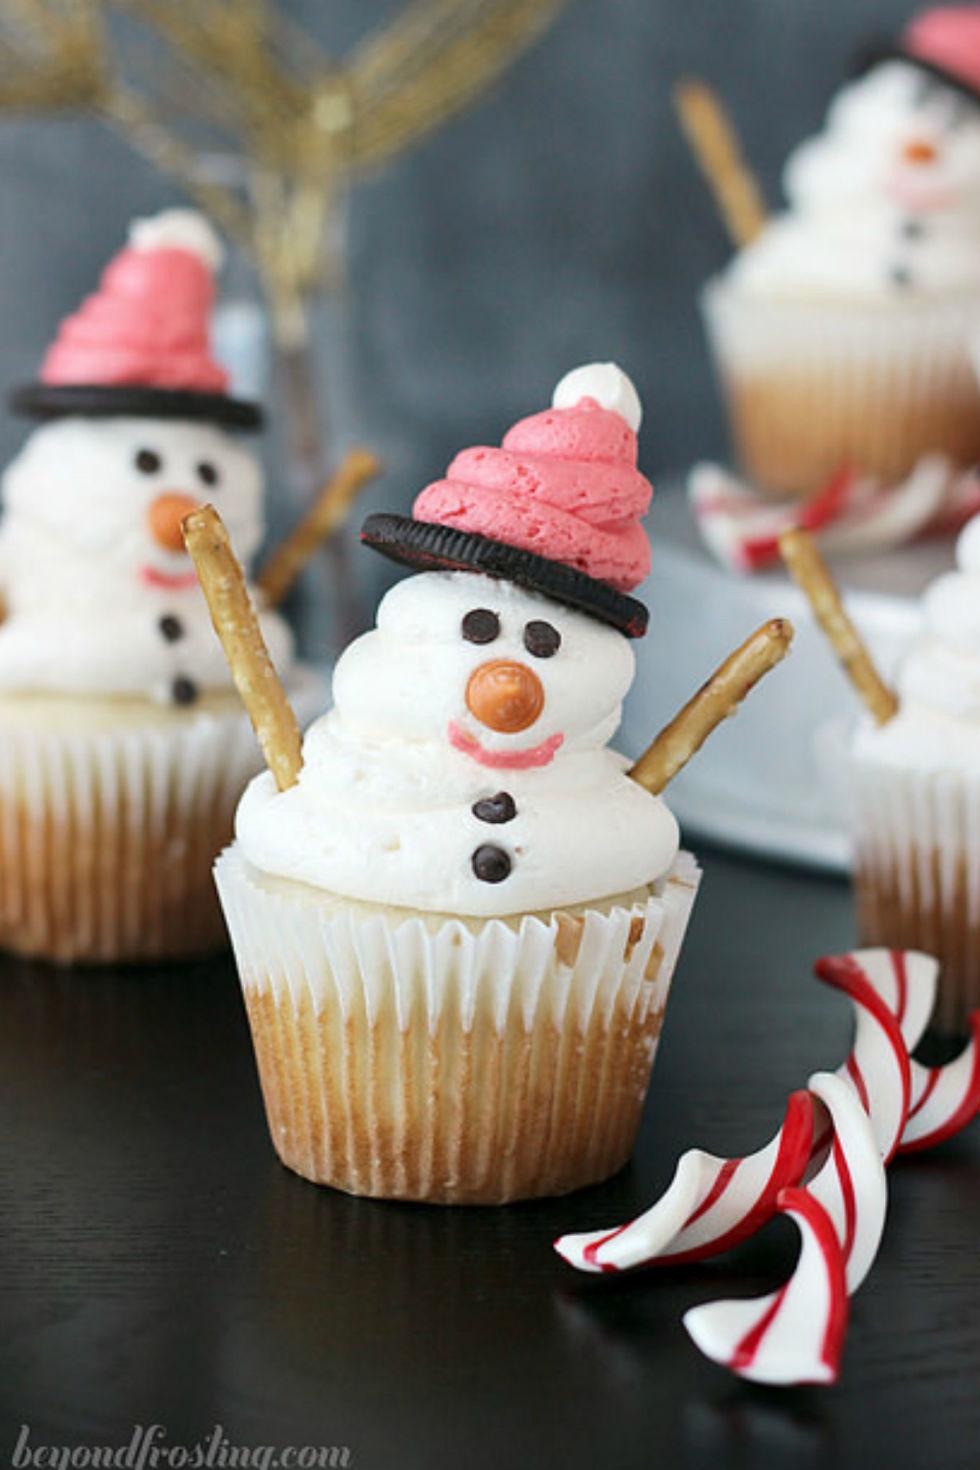 Best Of Christmas Cupcakes Ideas 30 Easy Cupcake & Christmas Cupcakes Decorations Recipes   Psoriasisguru.com